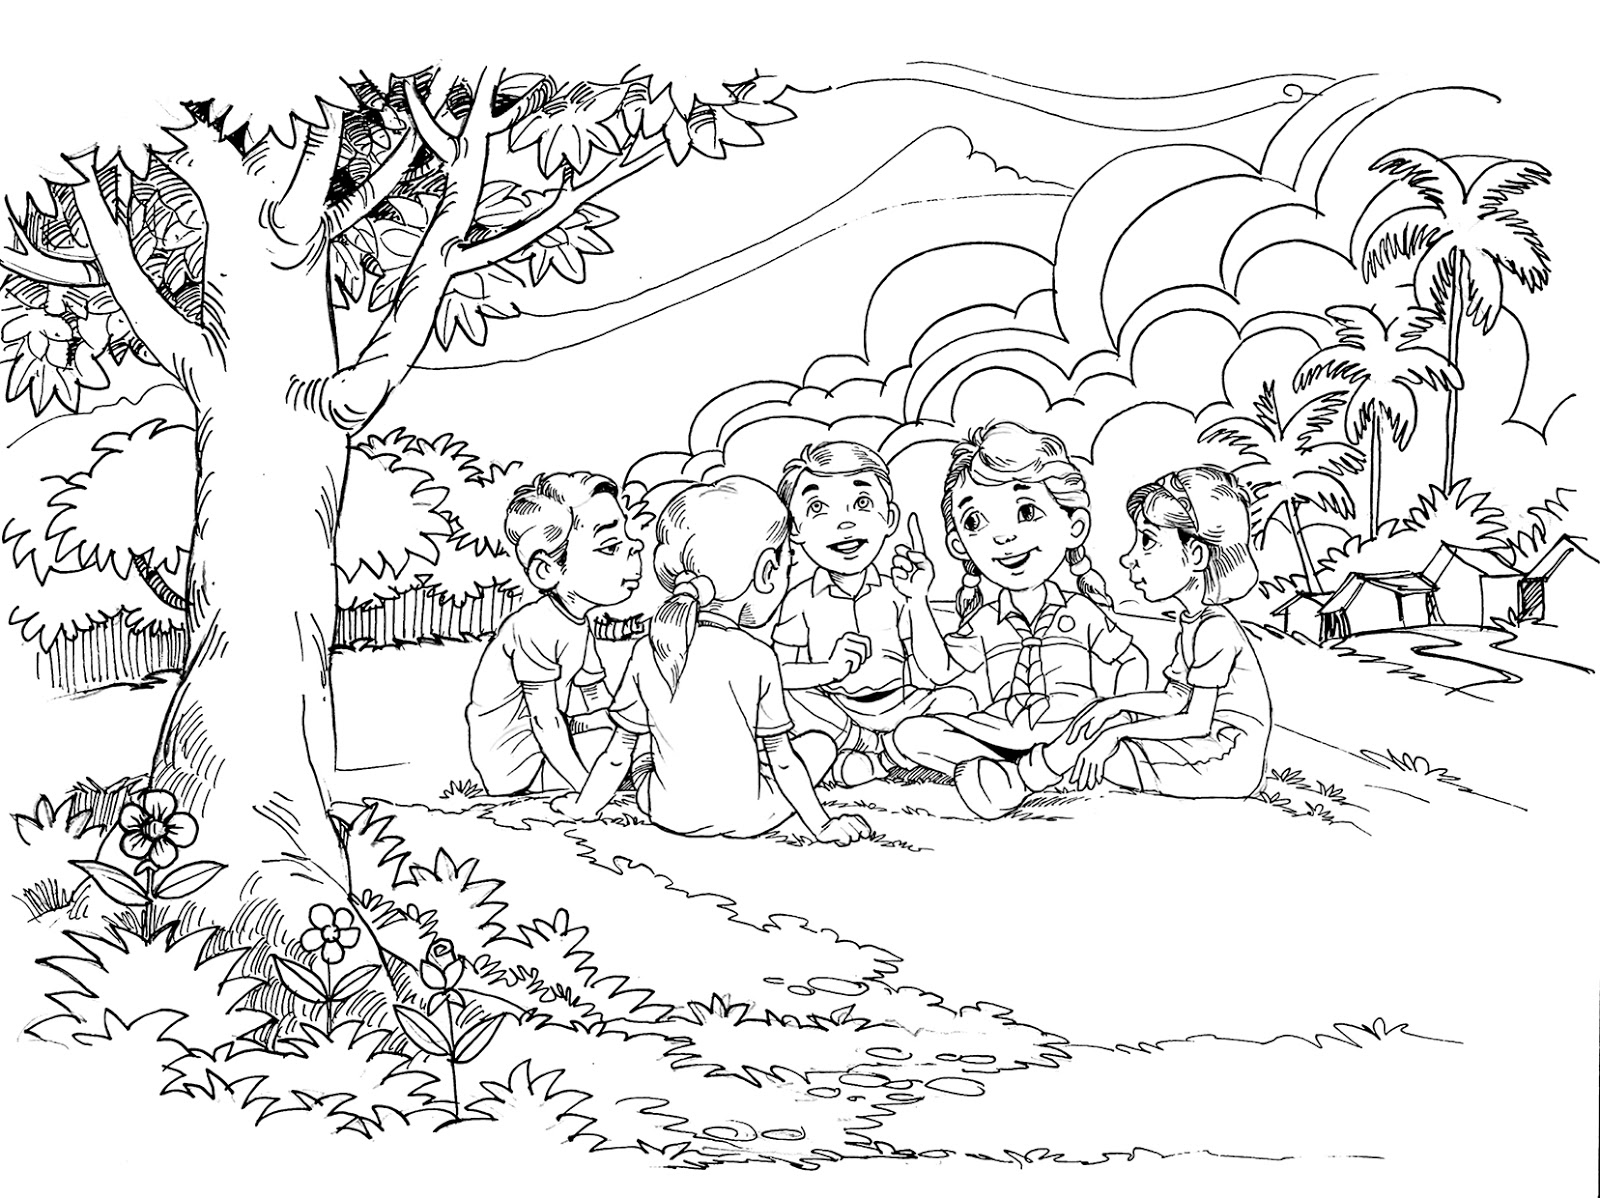 Sketsa Gambar Ilustrasi Buku Cerita Iluszi